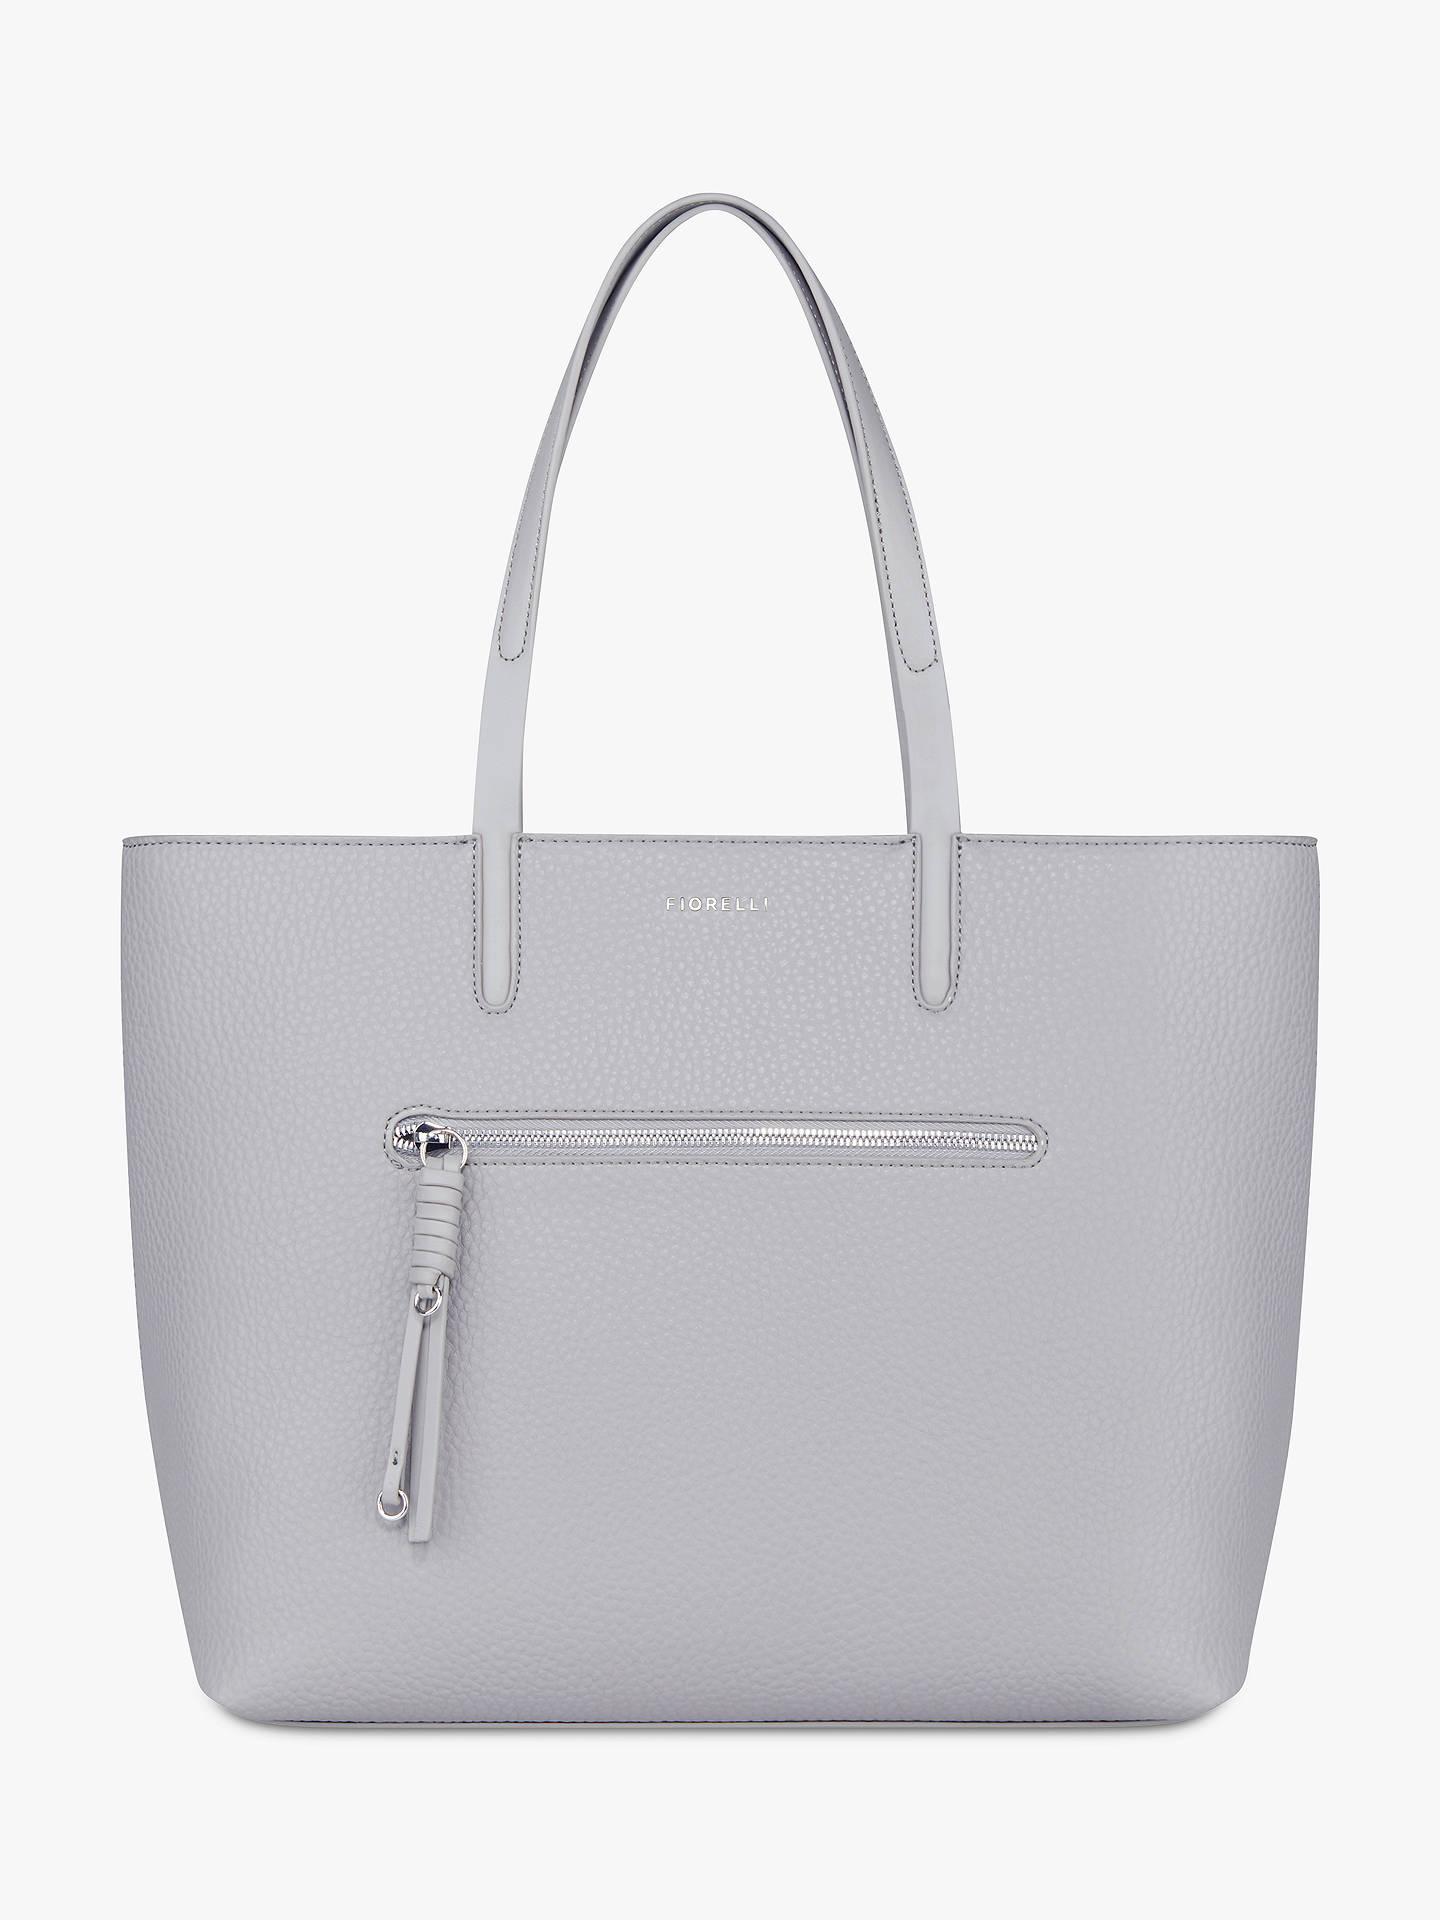 818e756385b4 Fiorelli Iris Shoulder Bag at John Lewis   Partners